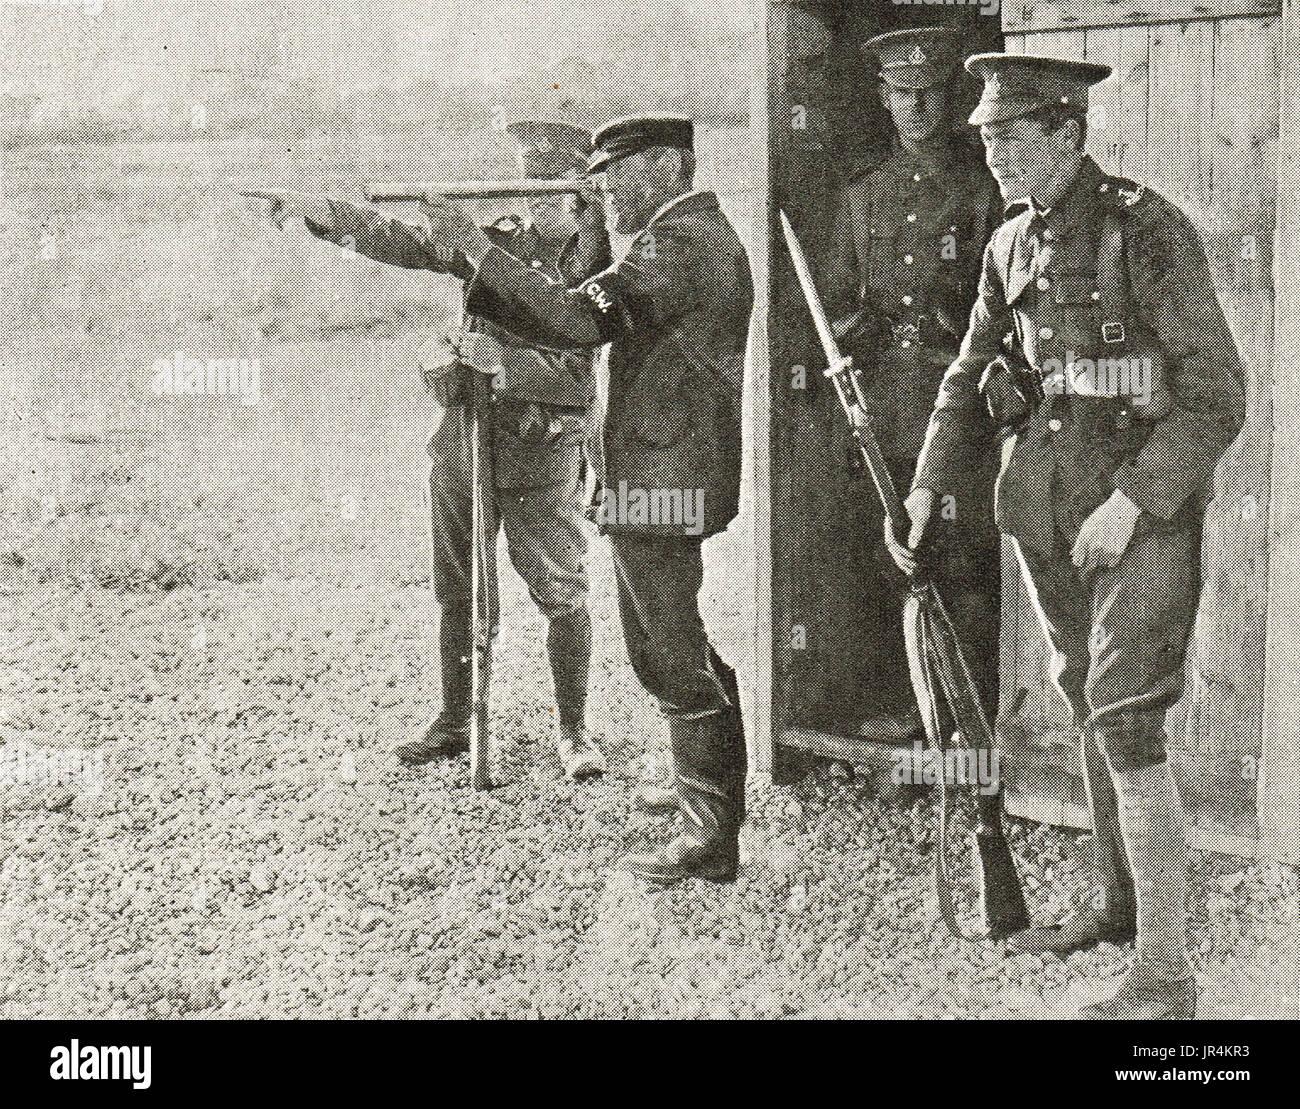 Hants Territorials on sentry duty, WW1 - Stock Image